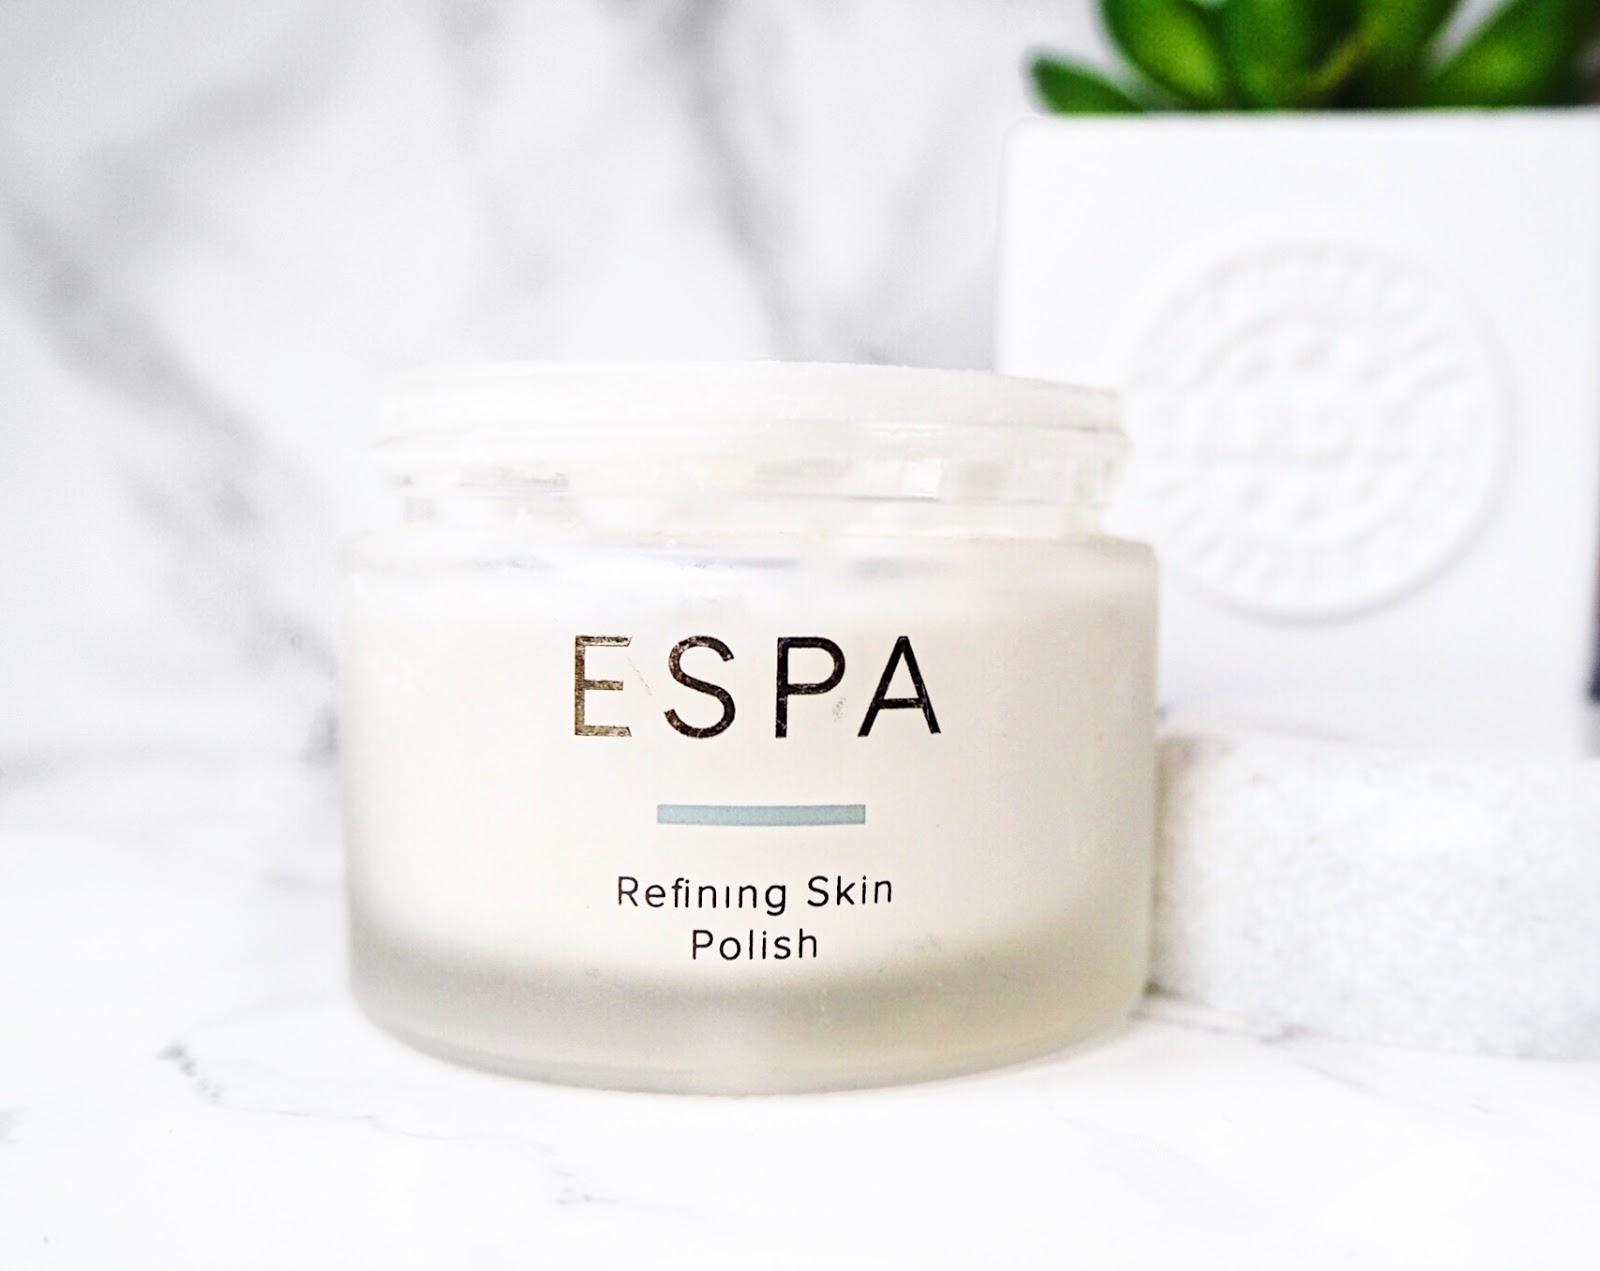 ESPA bestsellers Refining Skin Polish via India-Robyn